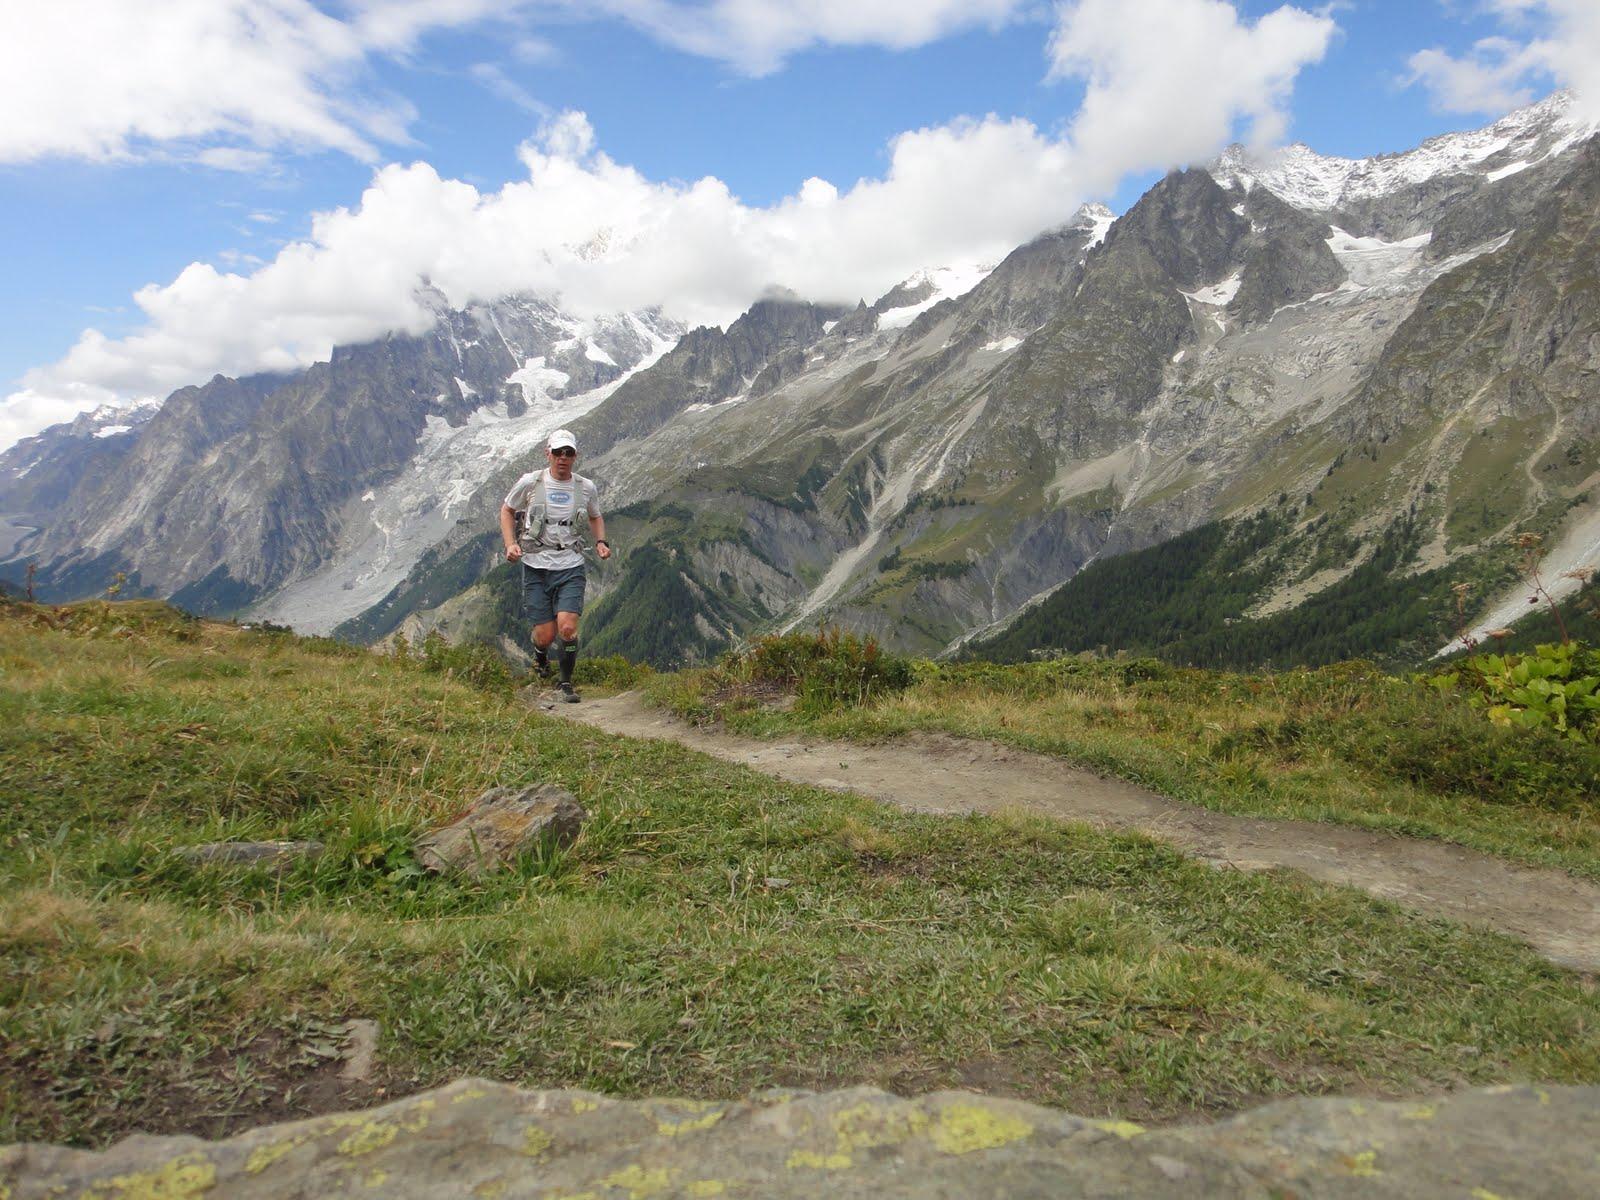 Trail Running Wallpaper Lonerunmans trailrunning 1600x1200